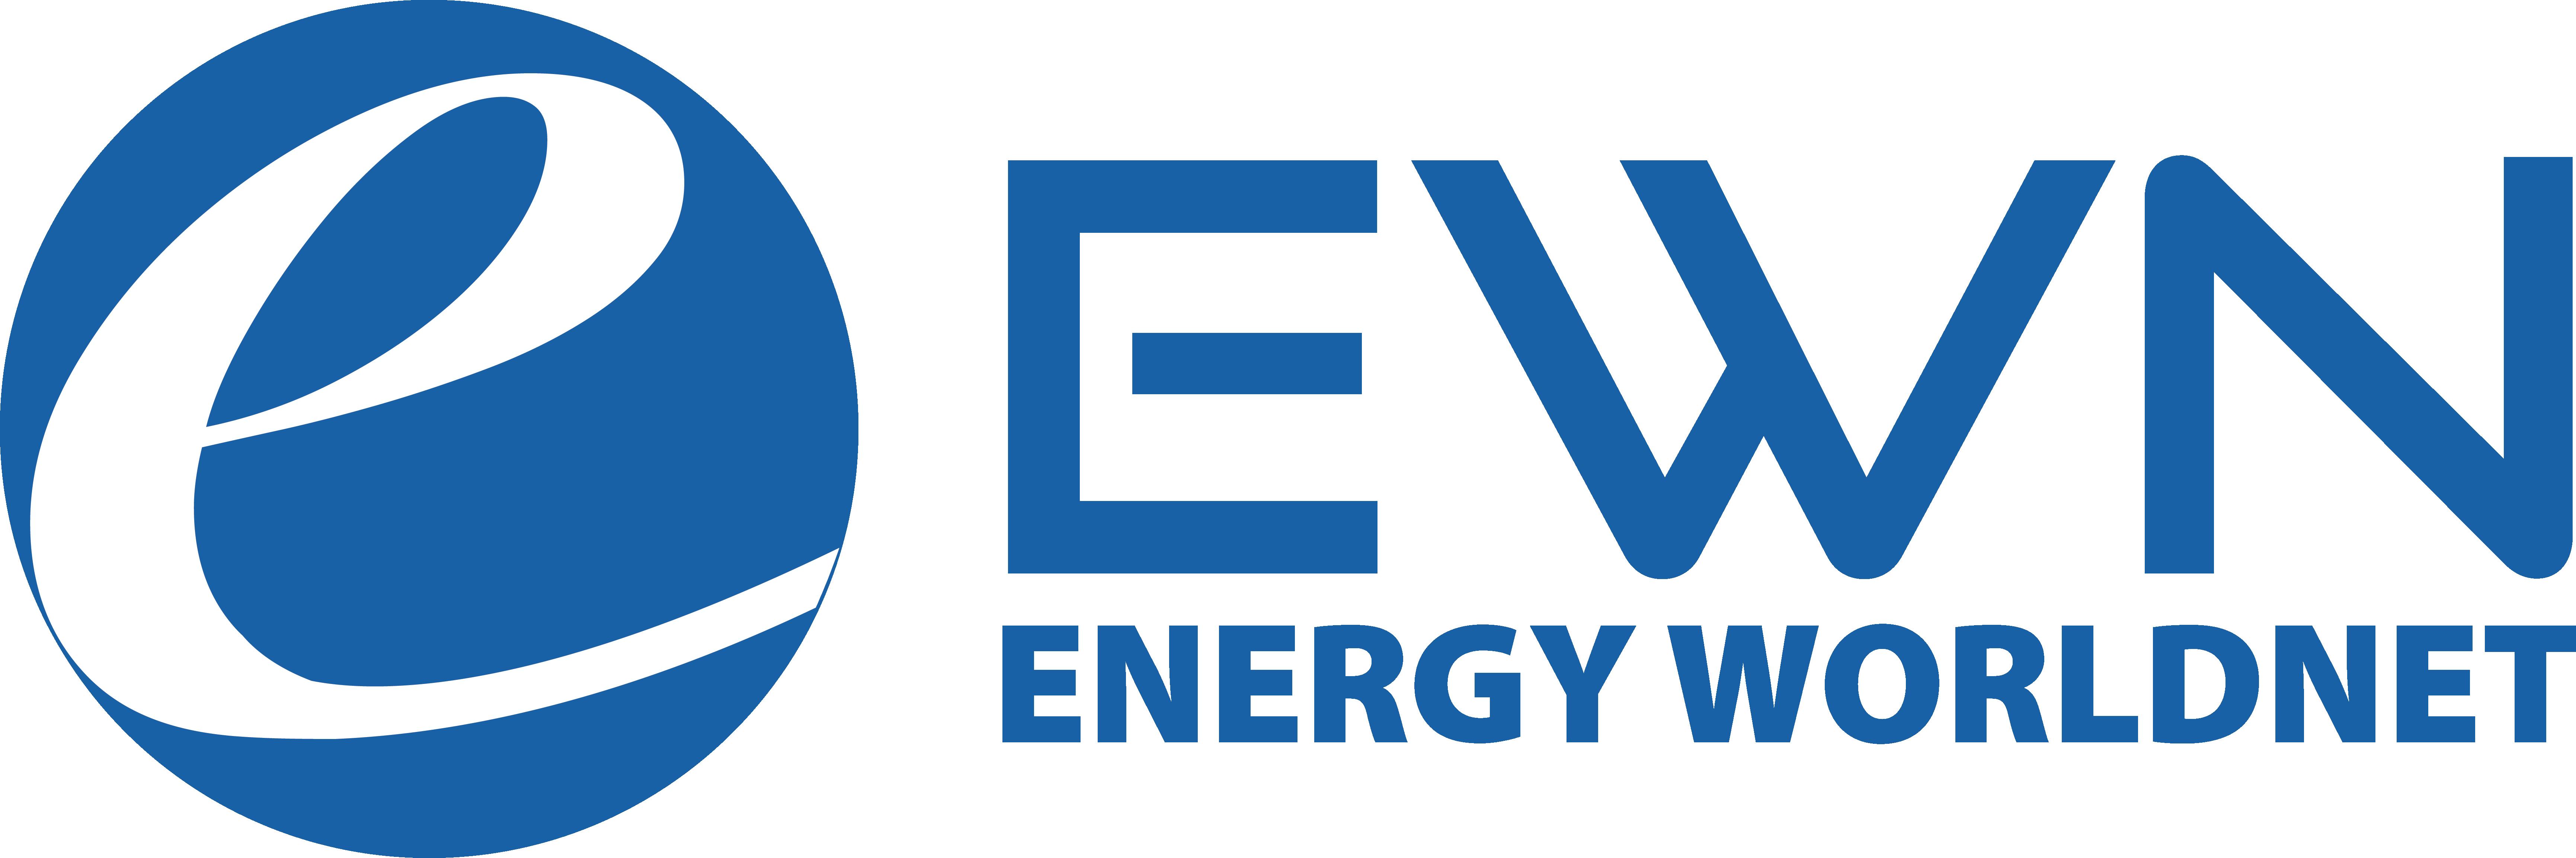 EWN - ENERGY worldnet logo